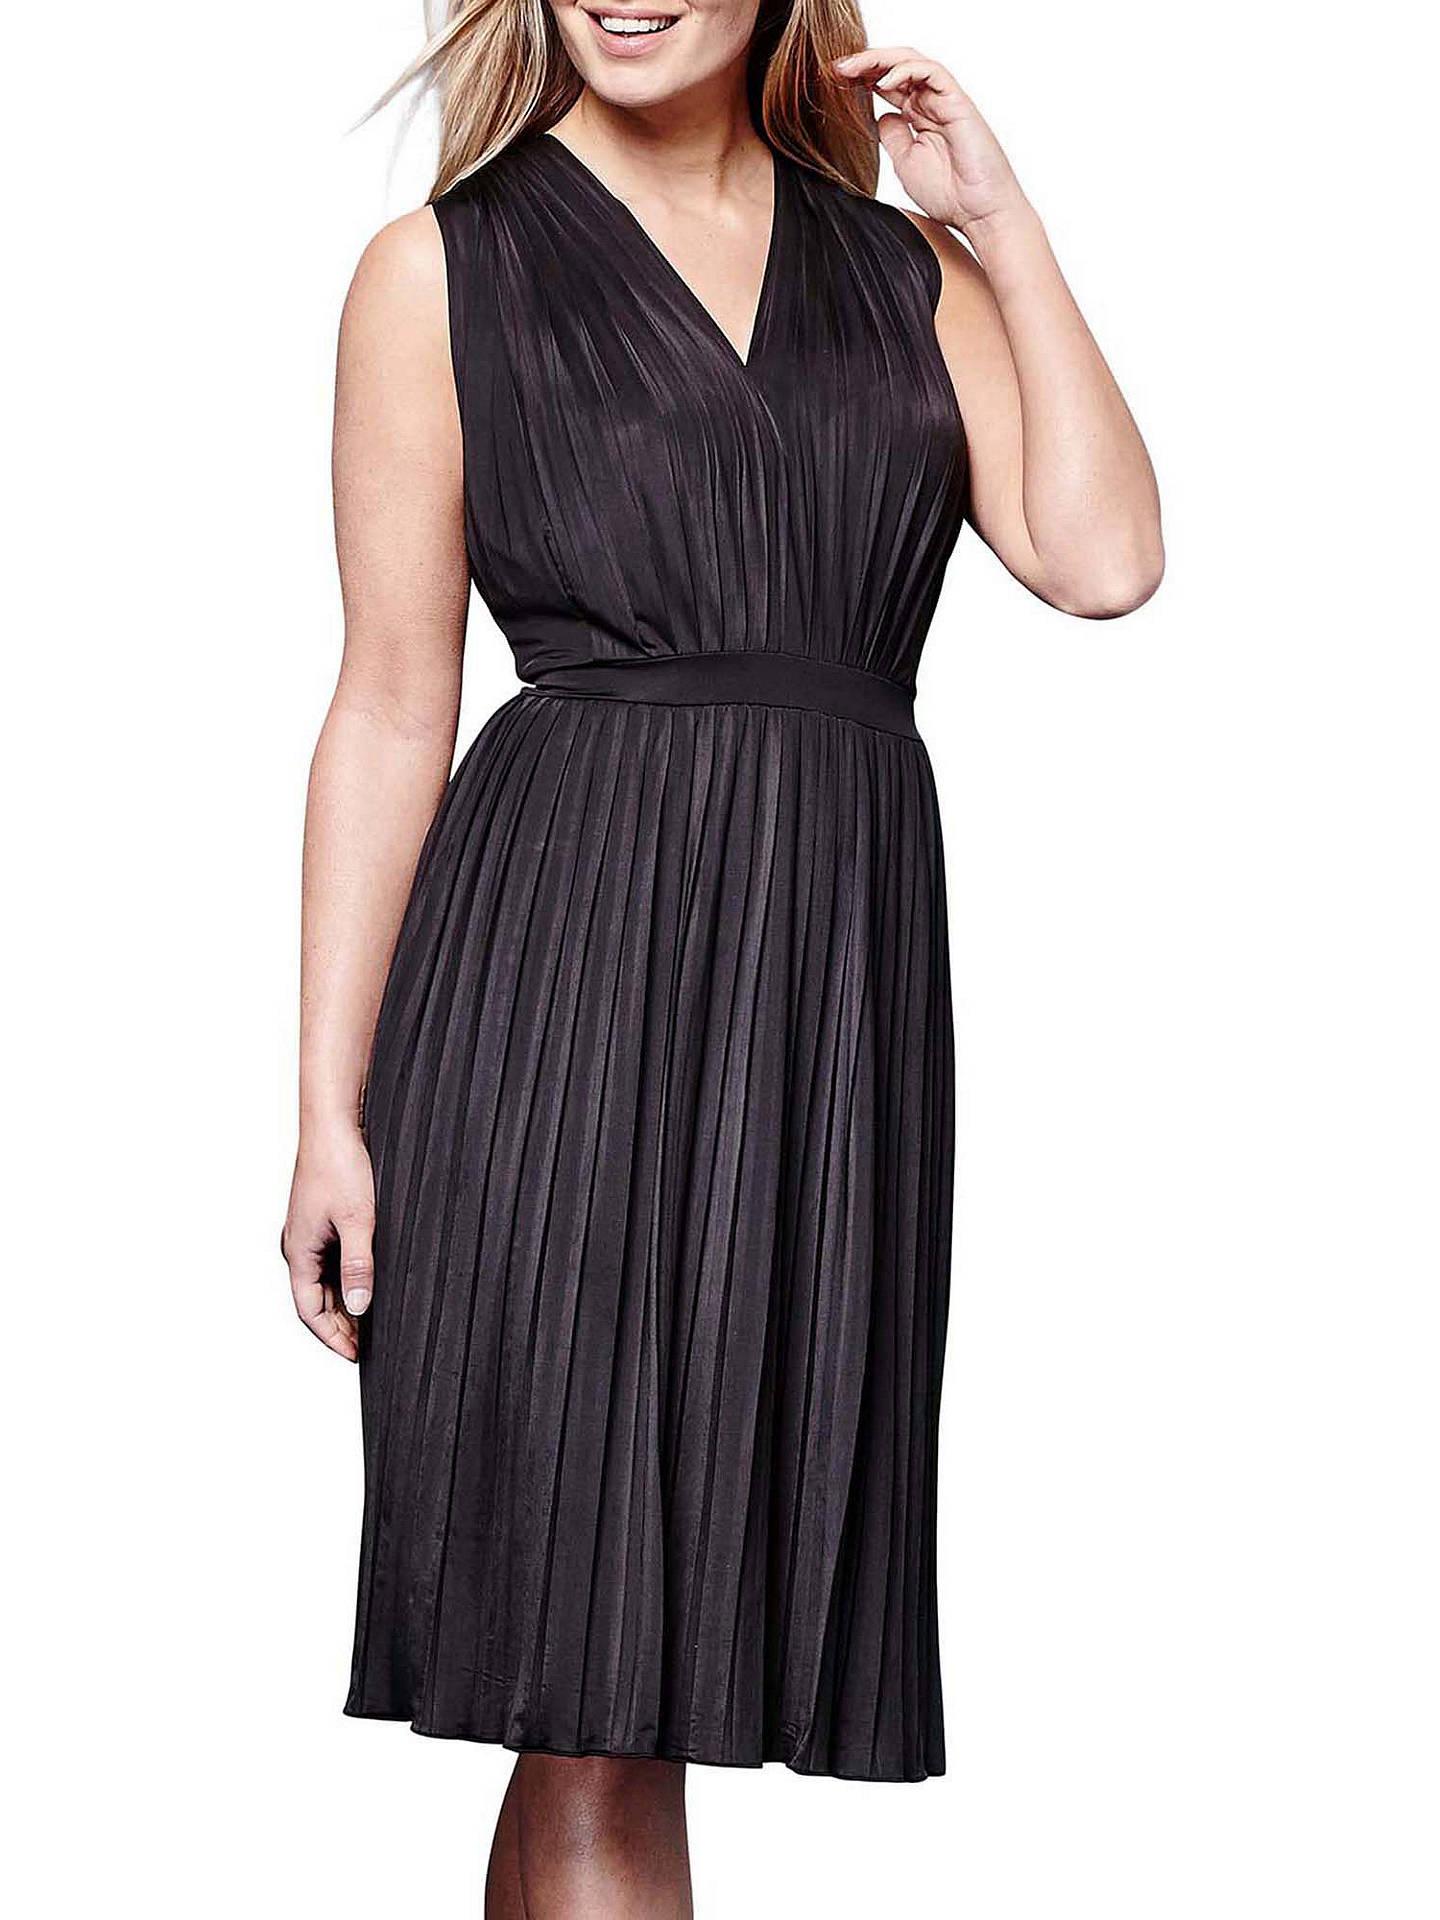 946e8868a5f Buy Yumi Pleated Midi Jersey Dress, Black, 8 Online at johnlewis.com ...